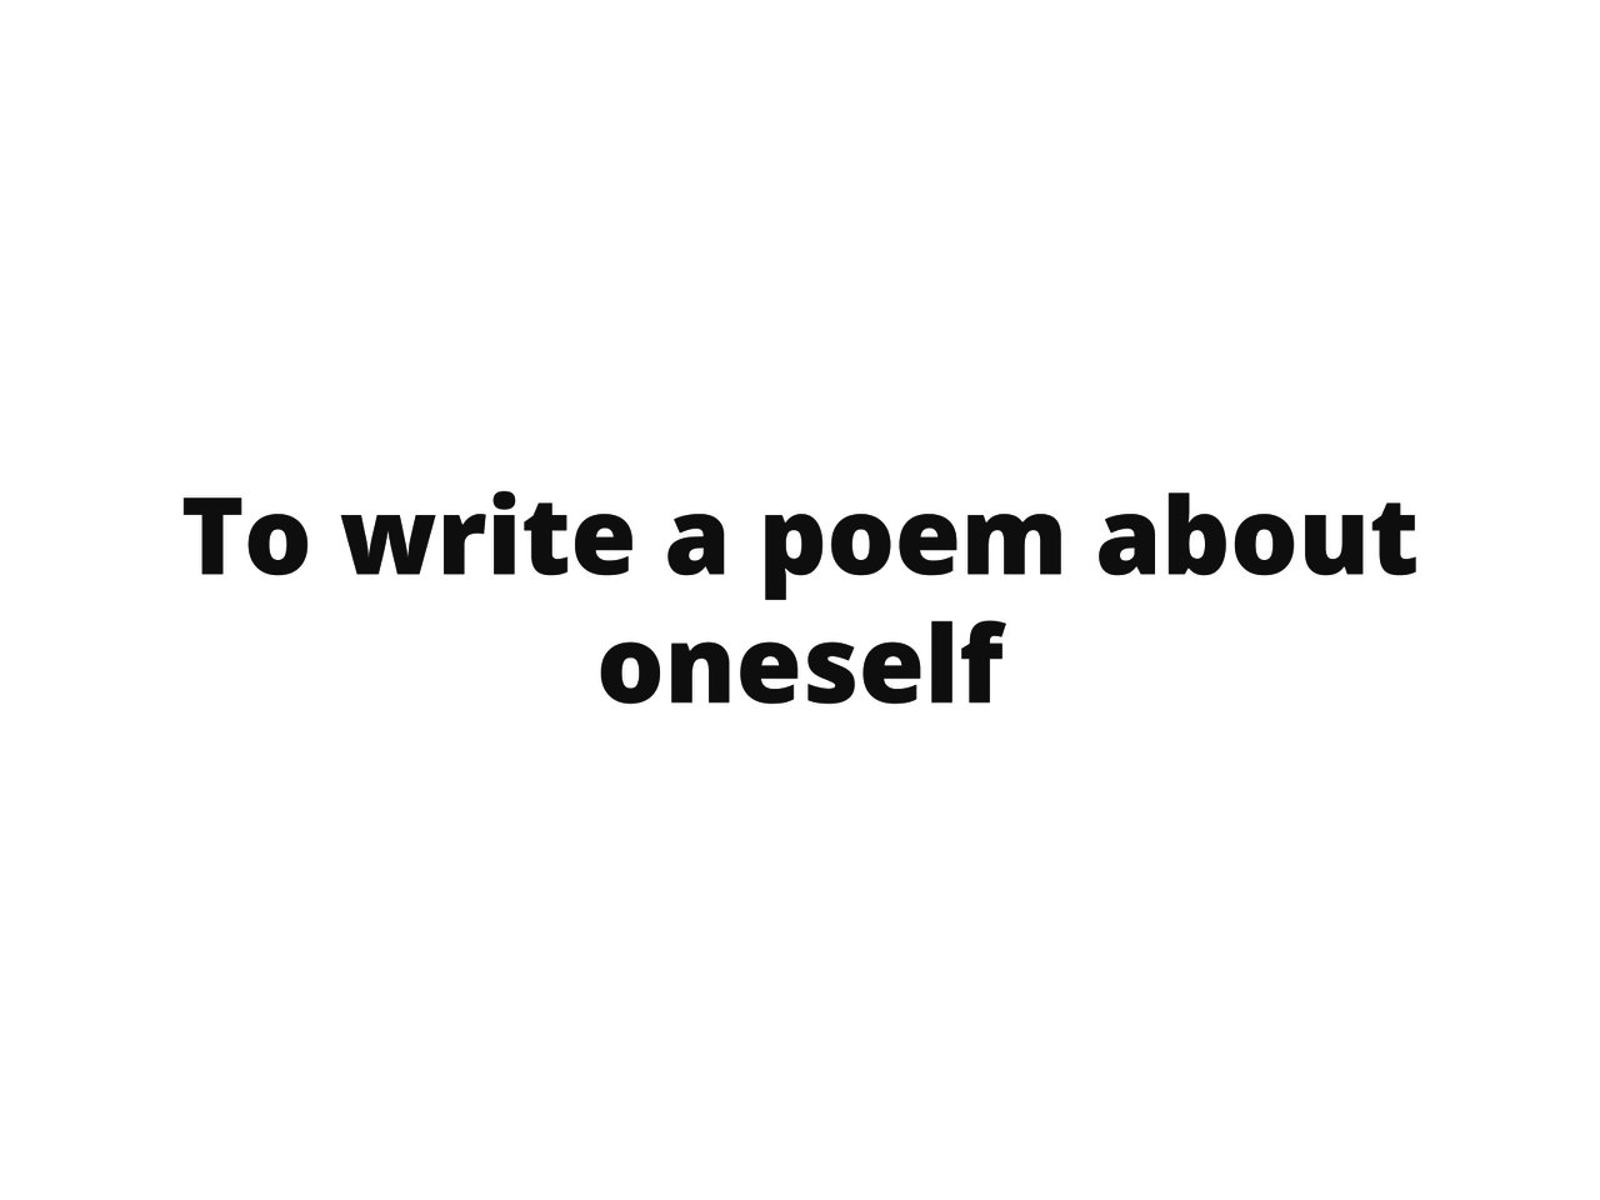 Poema biográfico